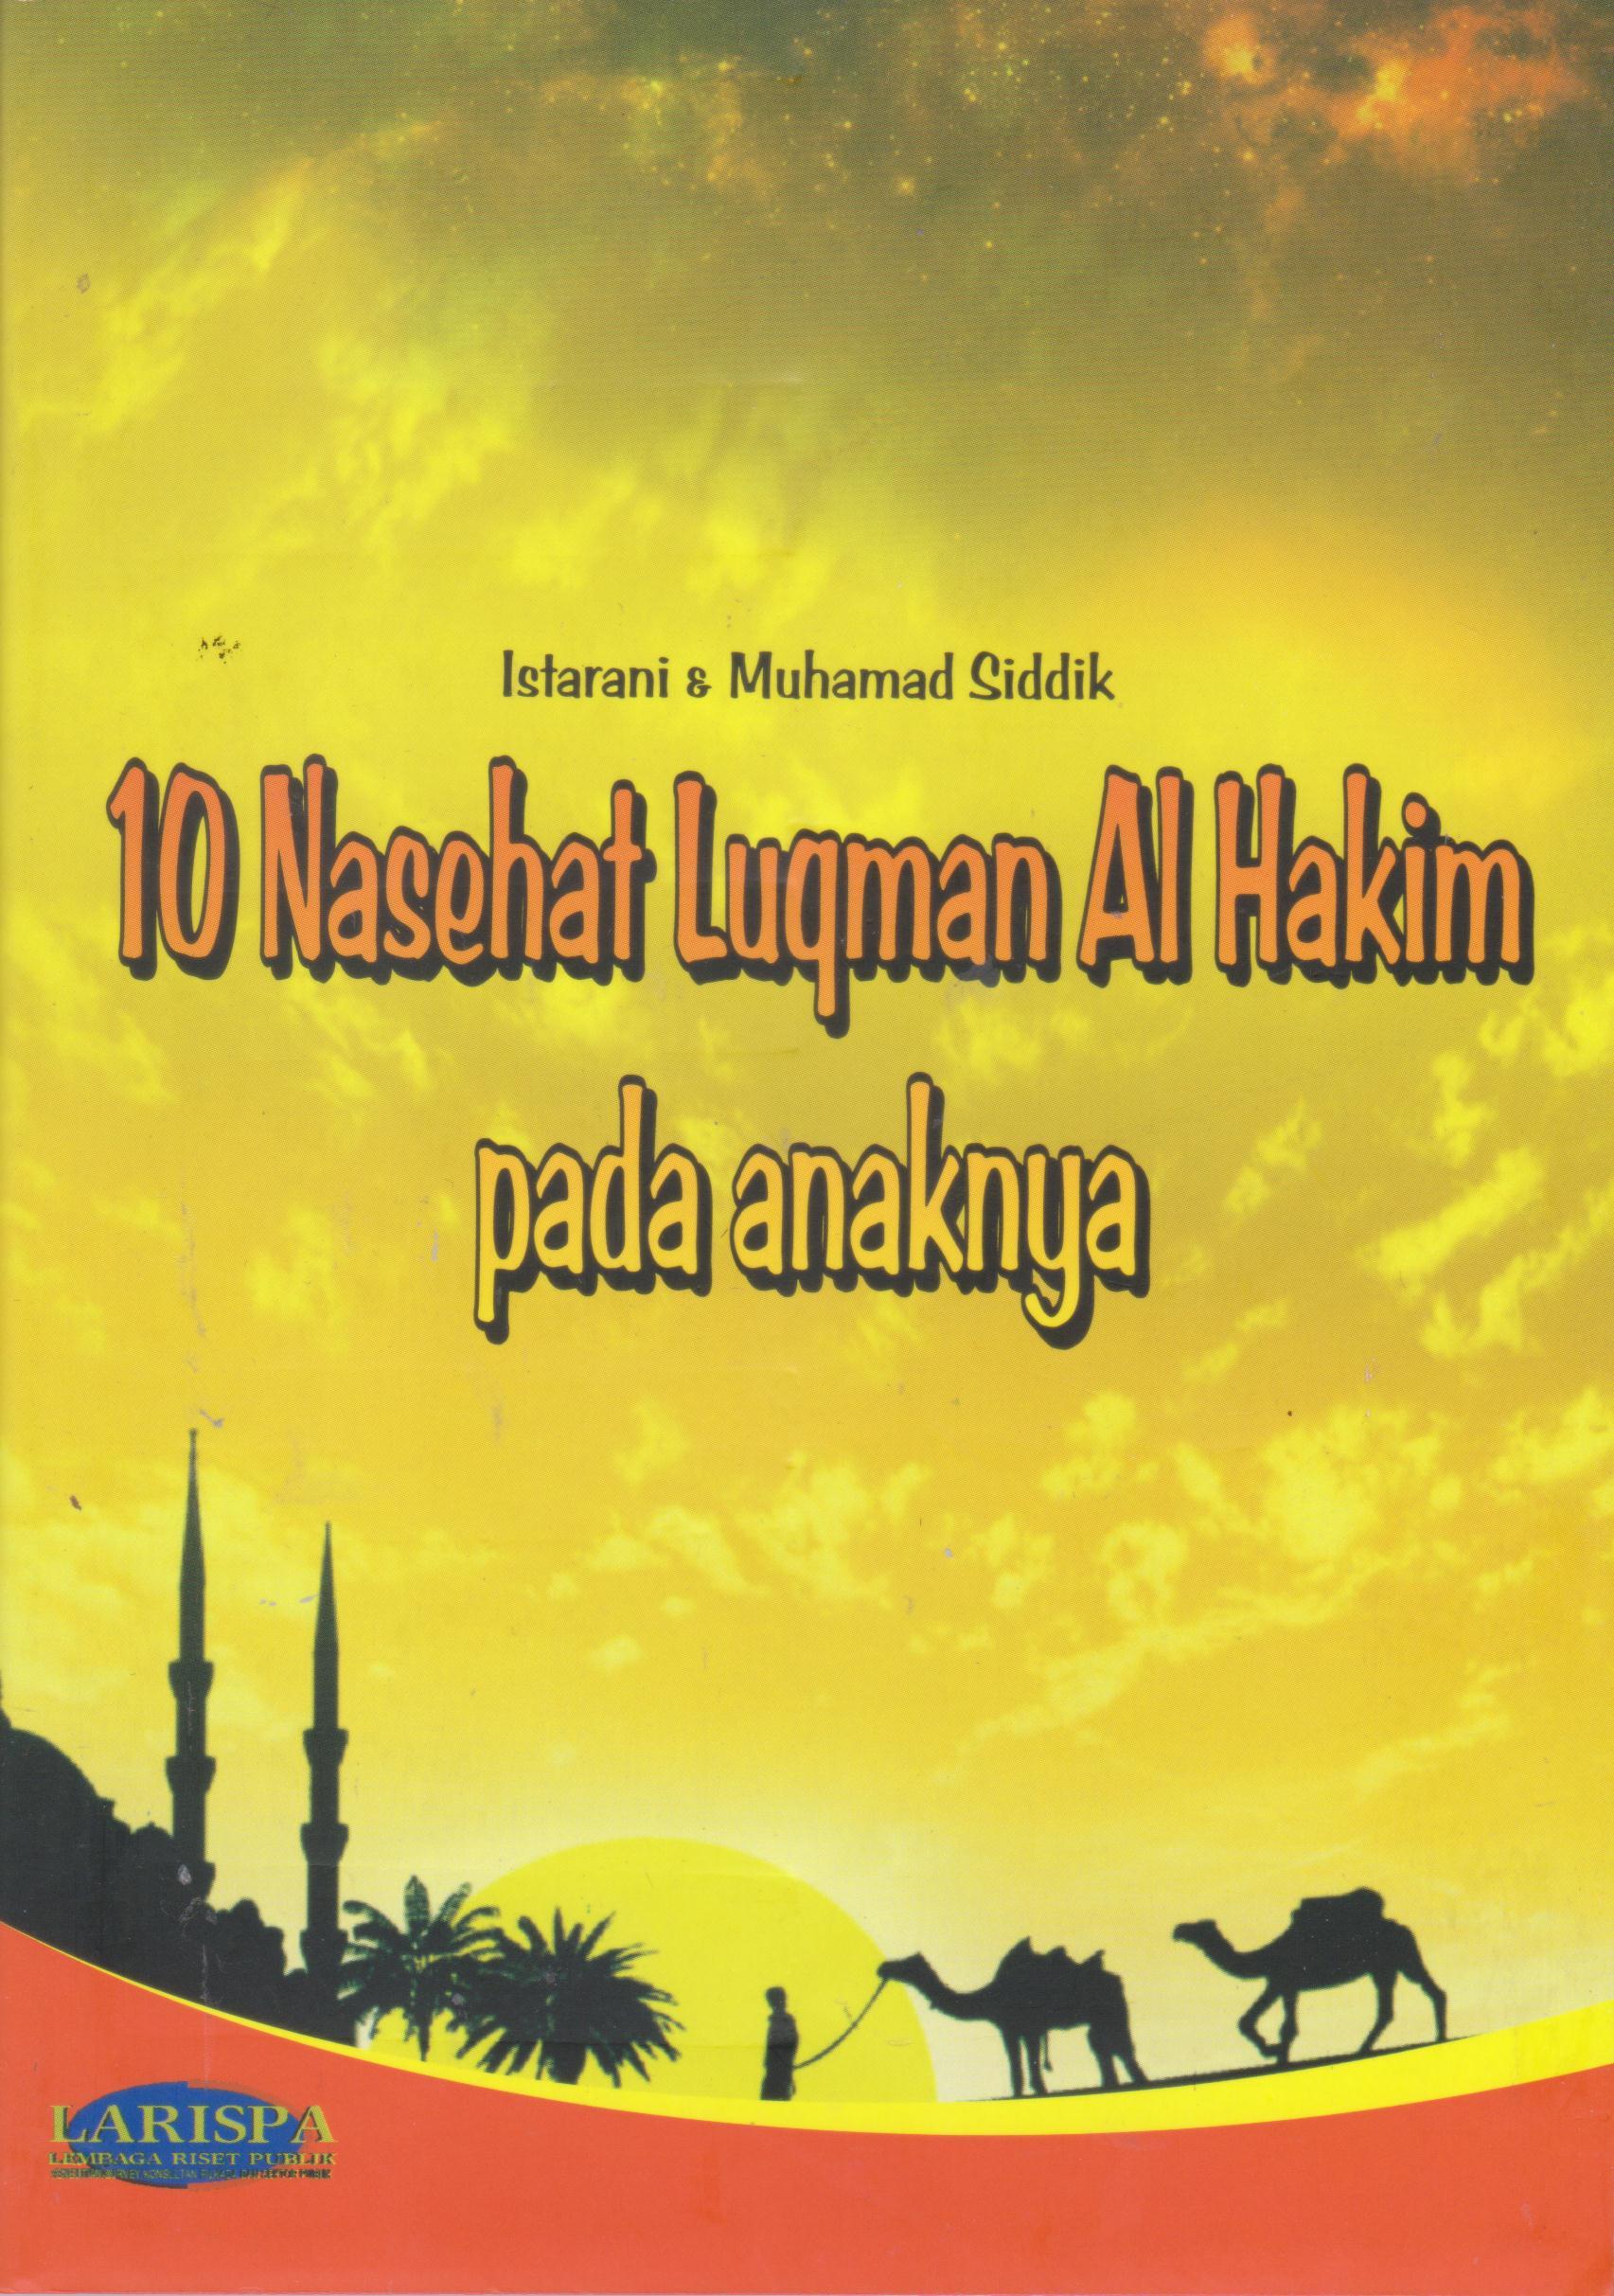 10 NASEHAT LUQMAN ALHAKIM PADA ANAKNYA